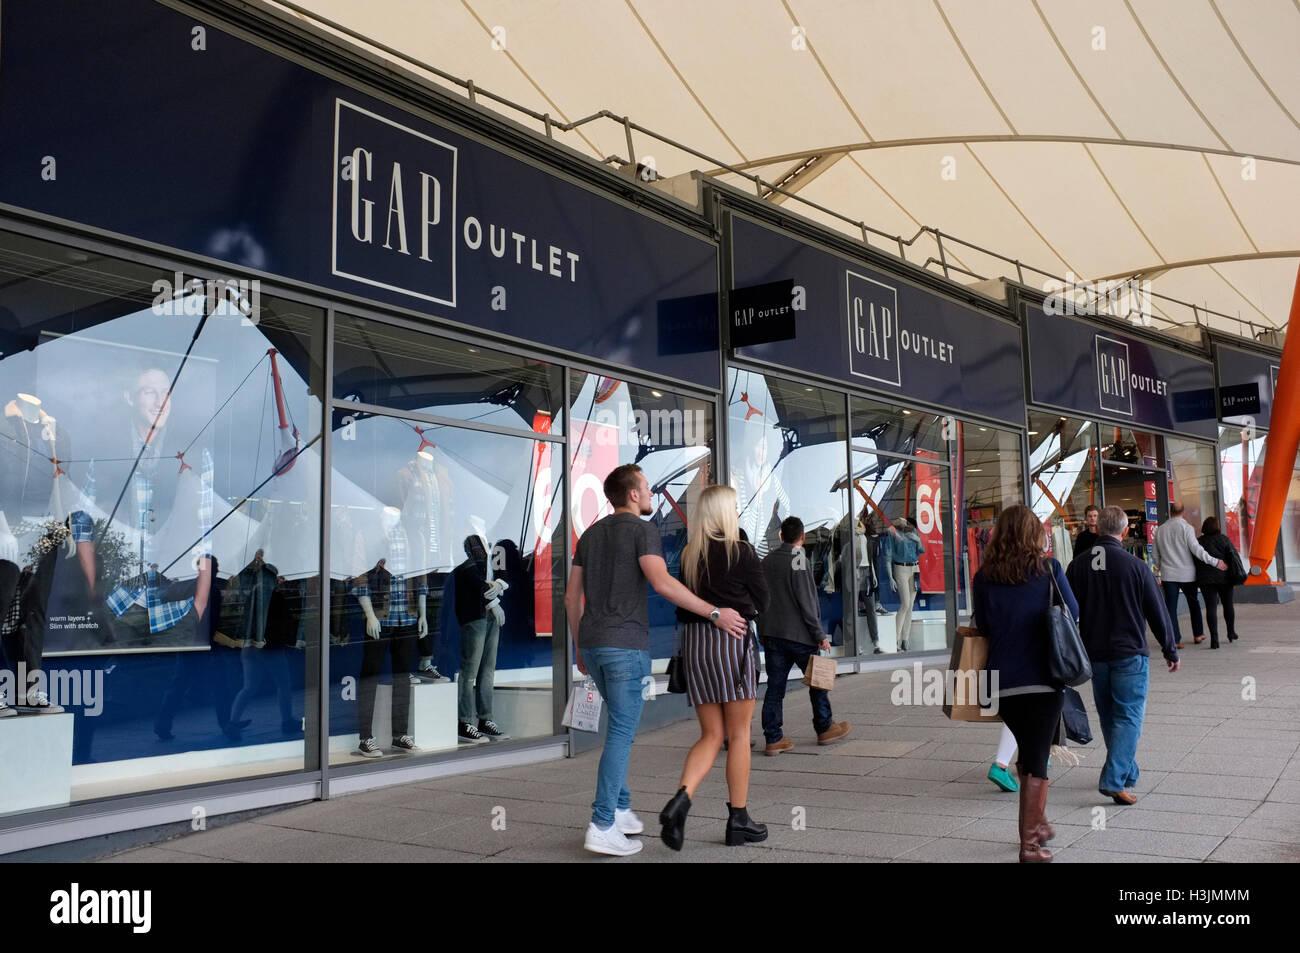 da155792cac gap fashion clothes outlet shop in ashford designer fashion outlet complex  county of kent uk october